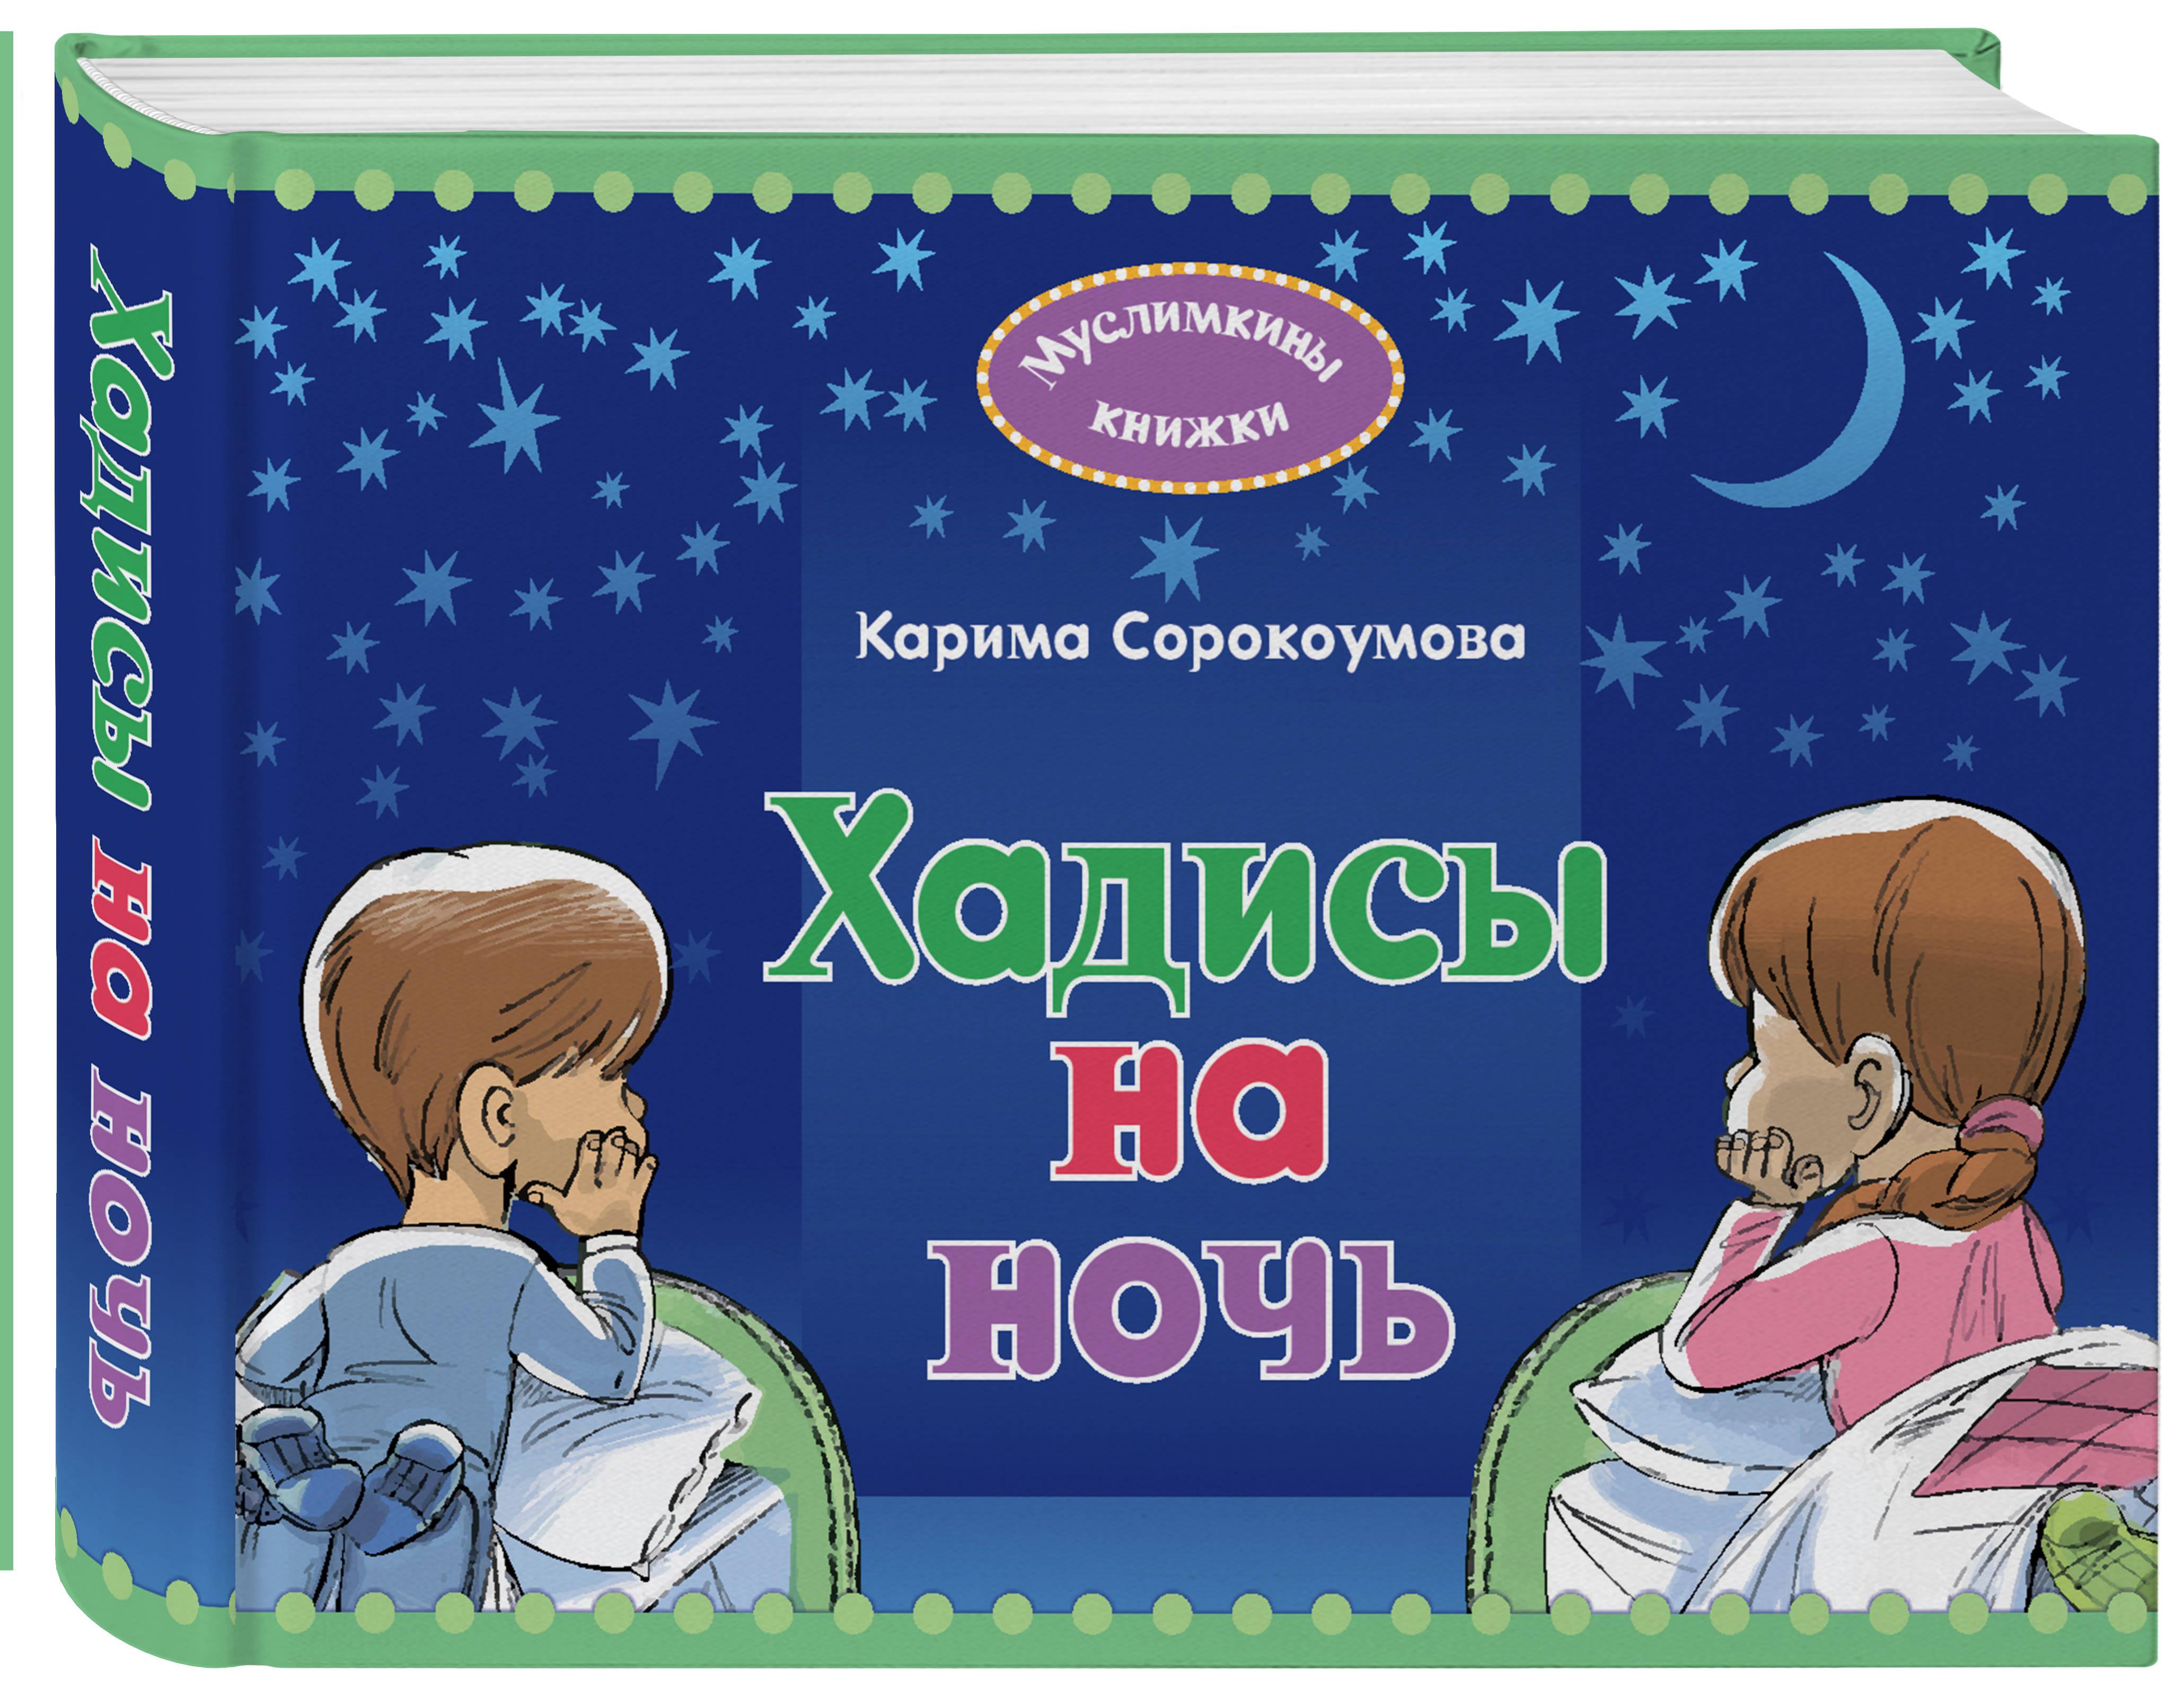 Хадисы на ночь ( Сорокоумова, Карима  )